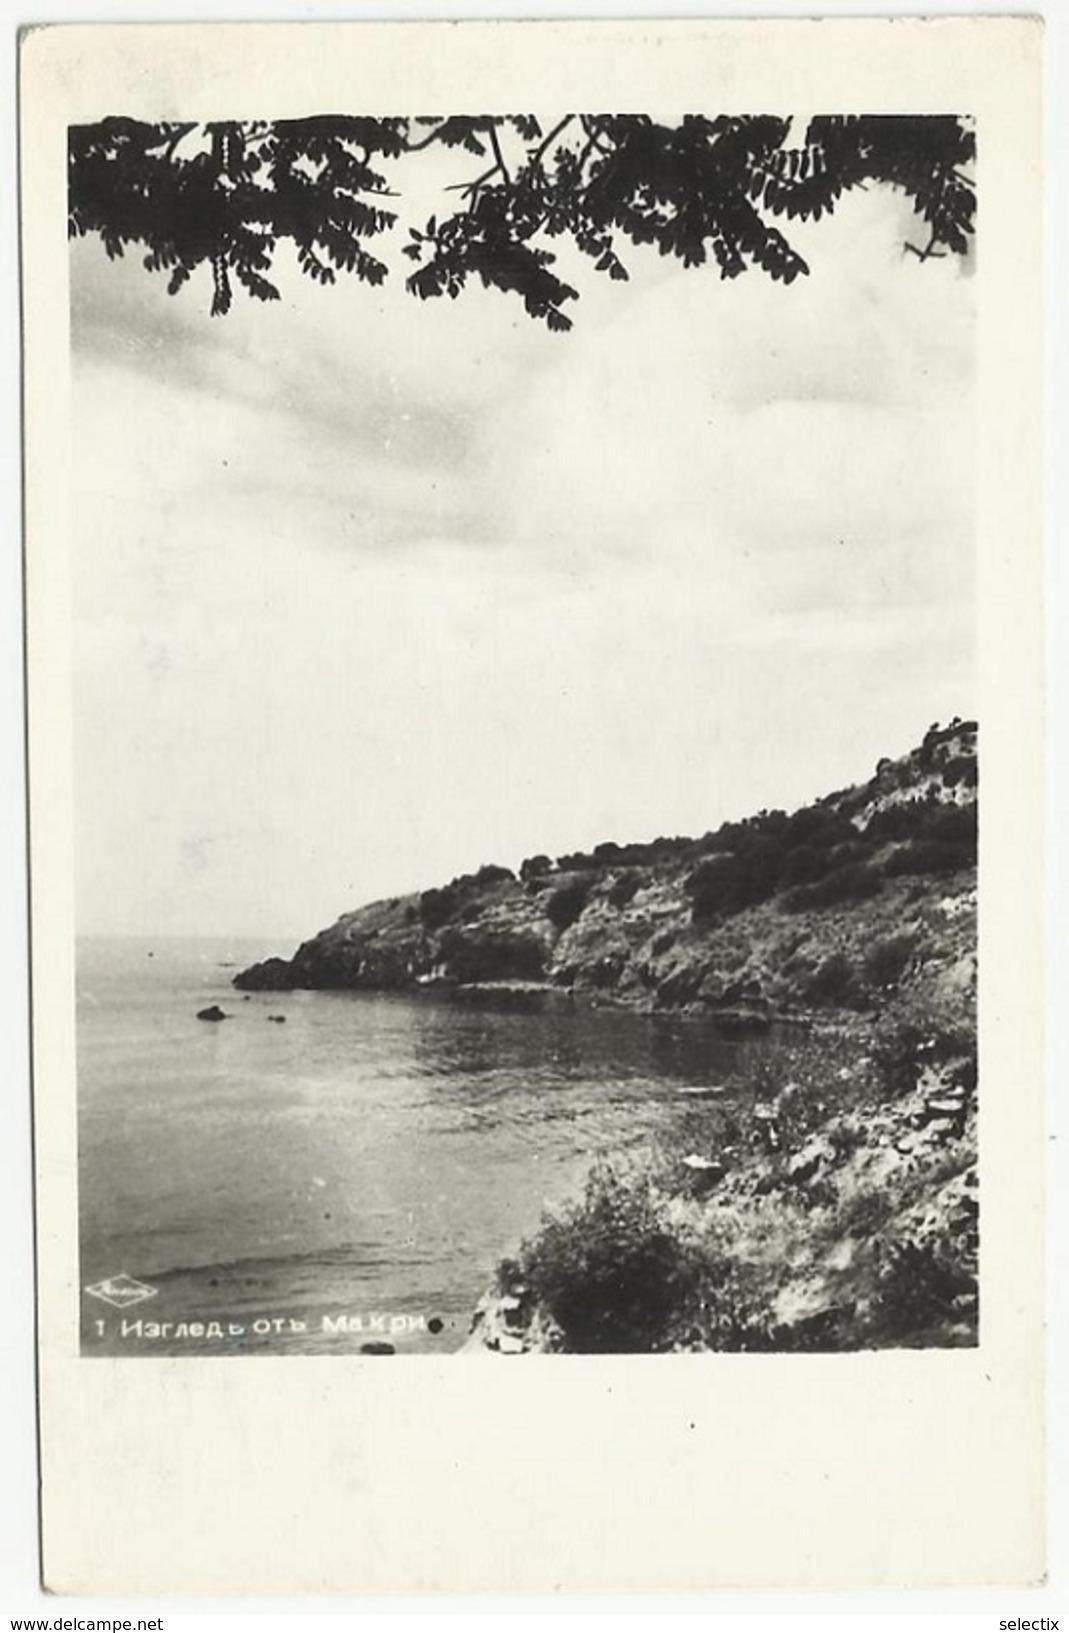 Greece 1943 Bulgarian Occupation Of Alexandroupolis - Makri - Dedeagh (Dedeagatch)